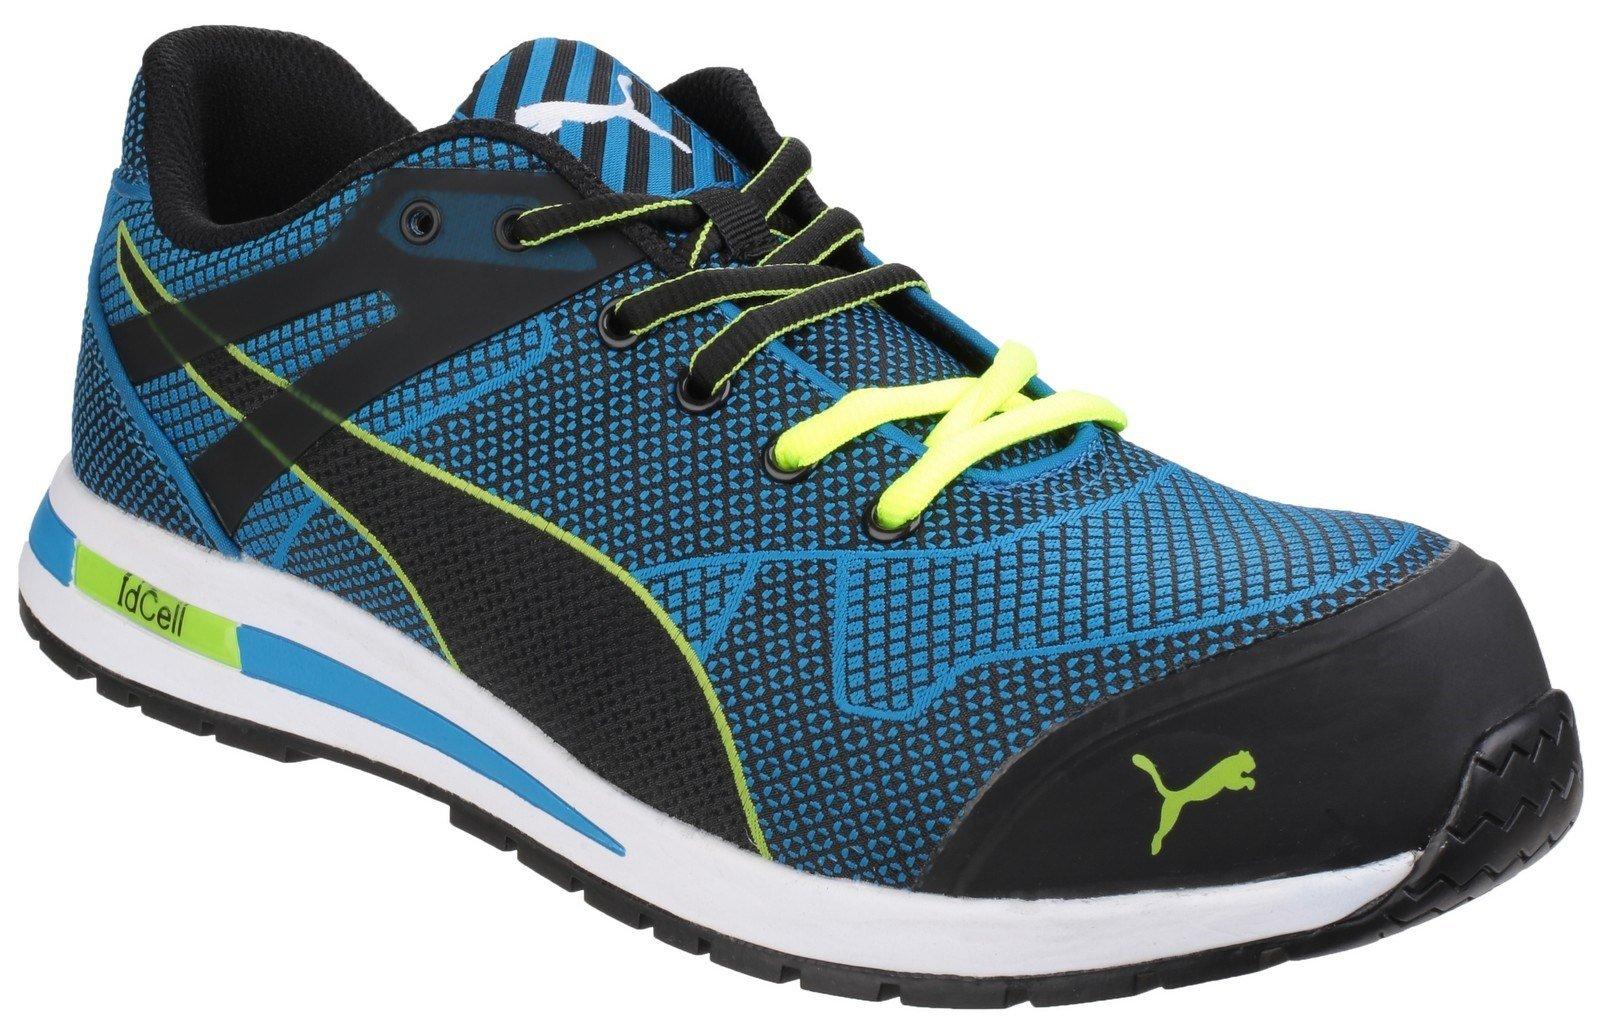 Puma Safety Unisex Blaze Knit Low Lace up Trainer Blue 24858 - Blue 6